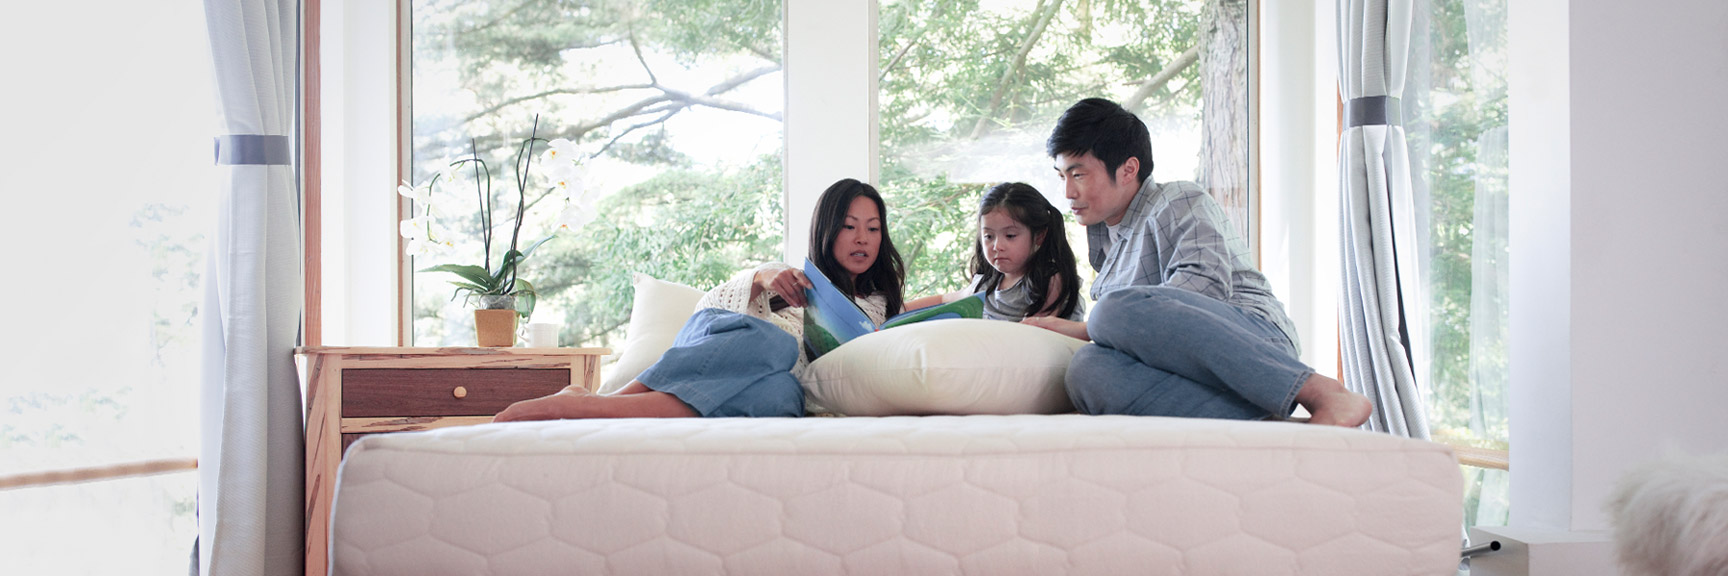 chemical free futon mattresses chemical free futon mattresses   eco friendly futon mattresses      rh   thefutonshop